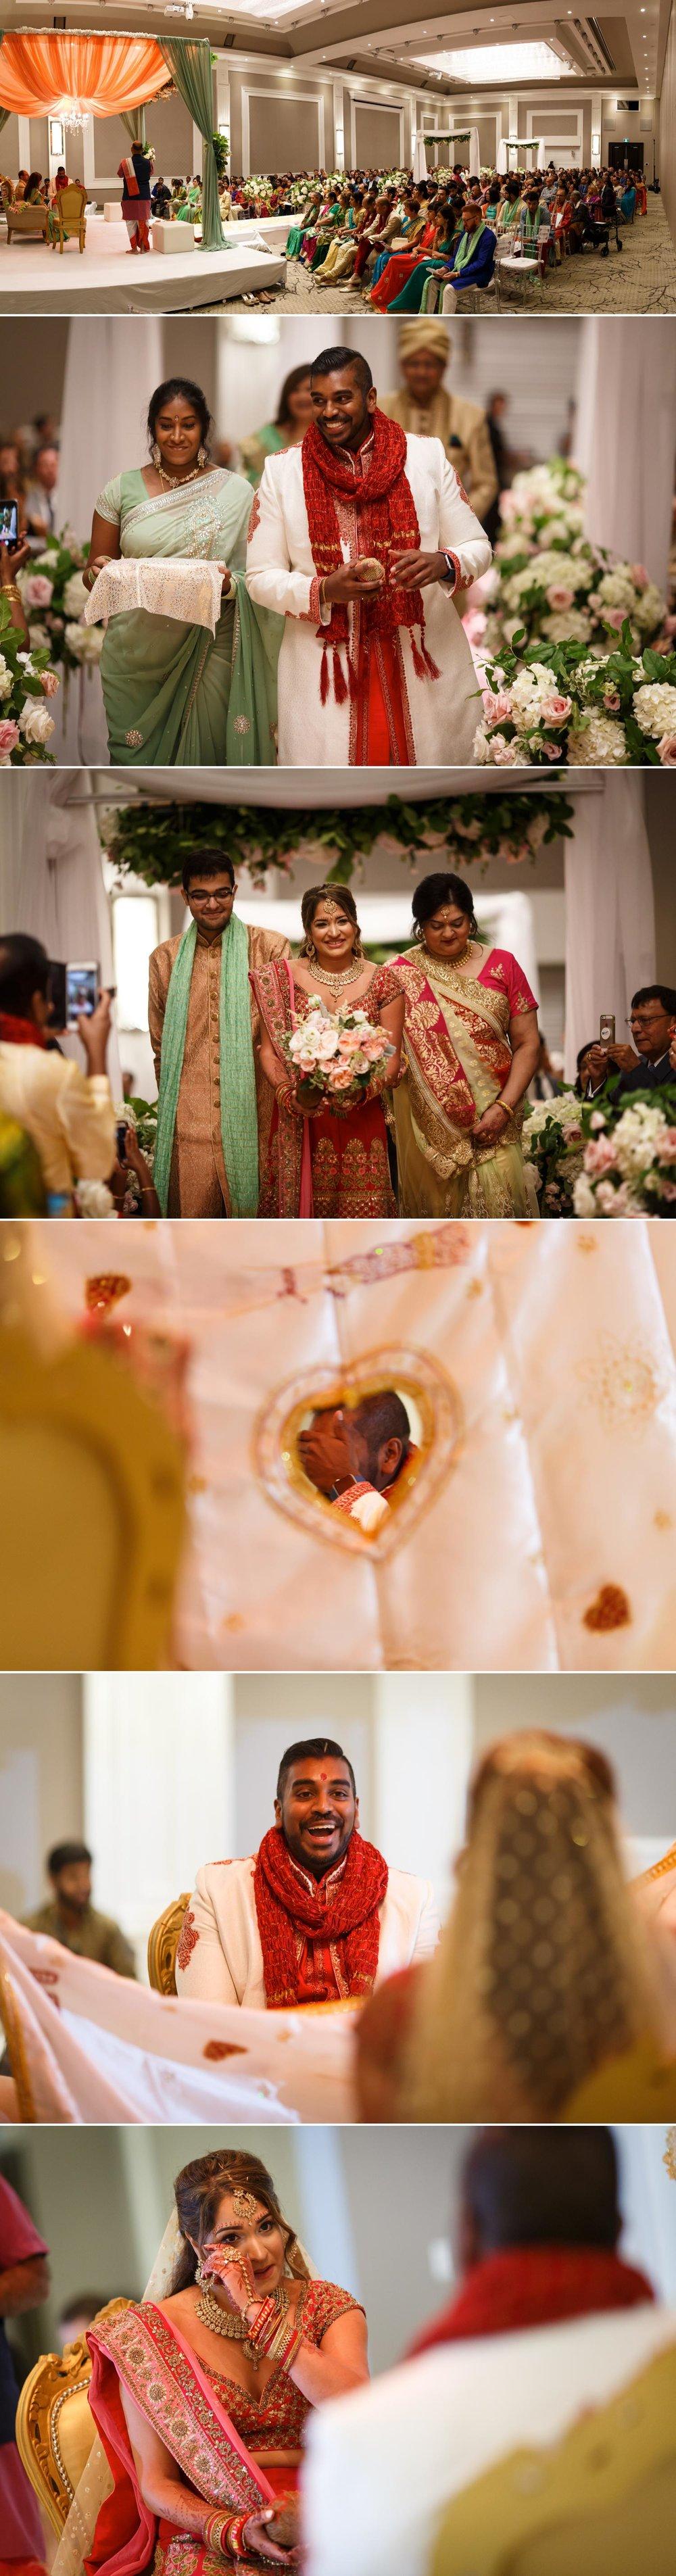 ottawa hindu indian wedding ceremony at infinity centre